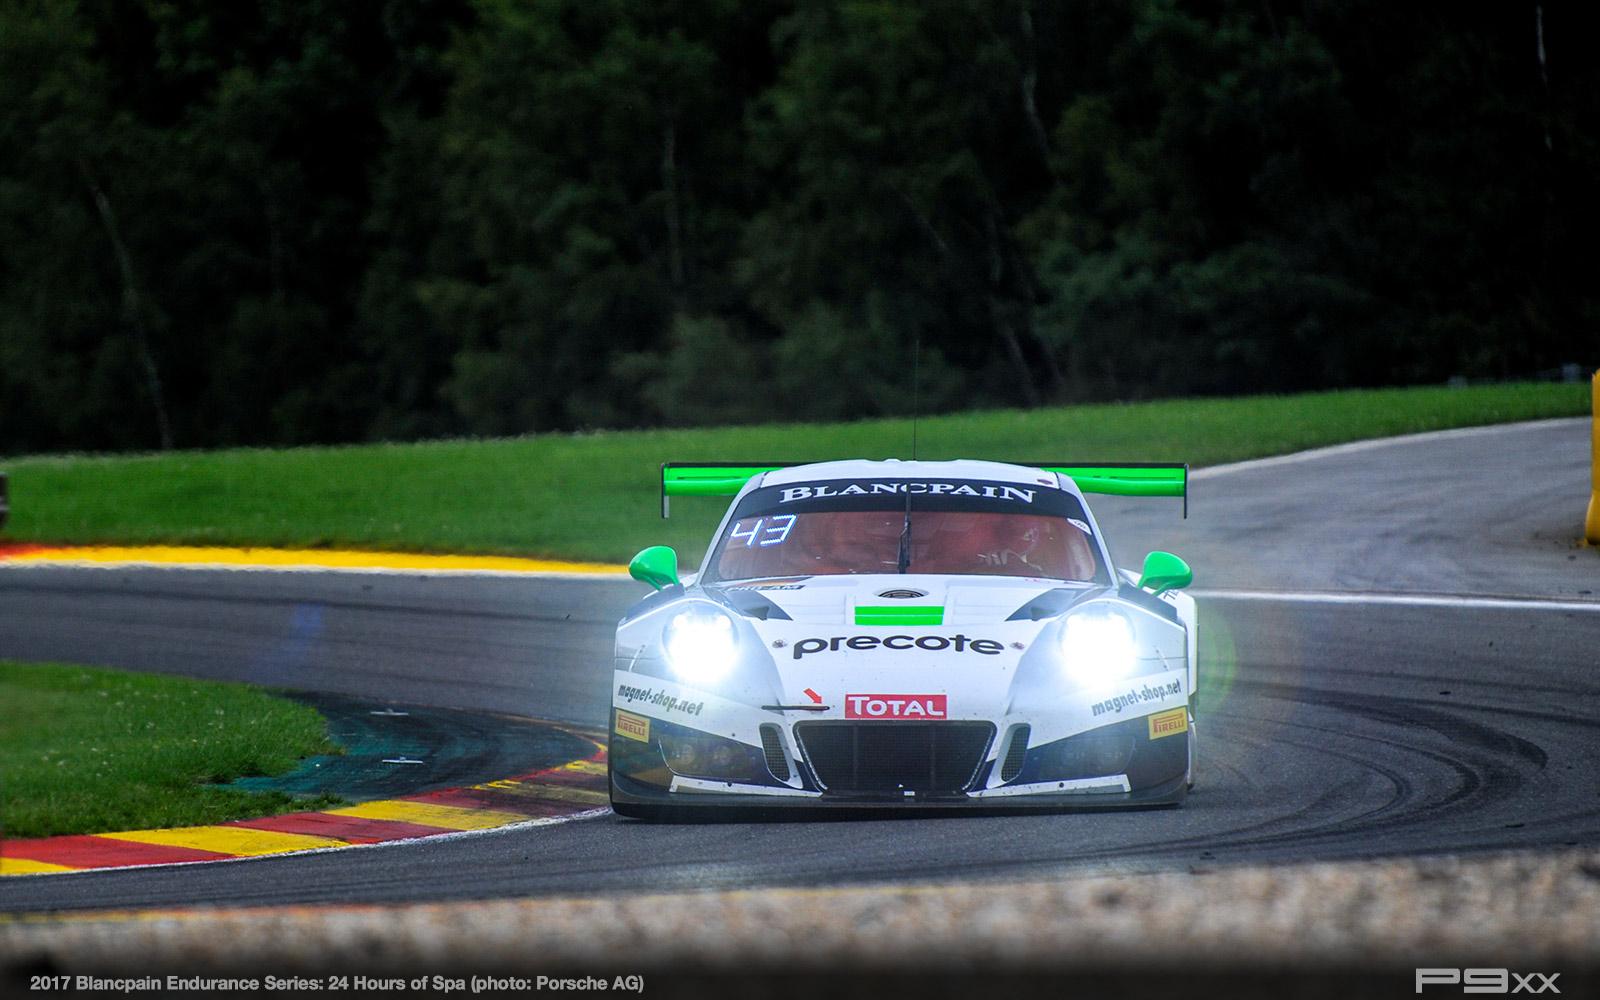 2017-24-Hours-of-Spa-Porsche-317